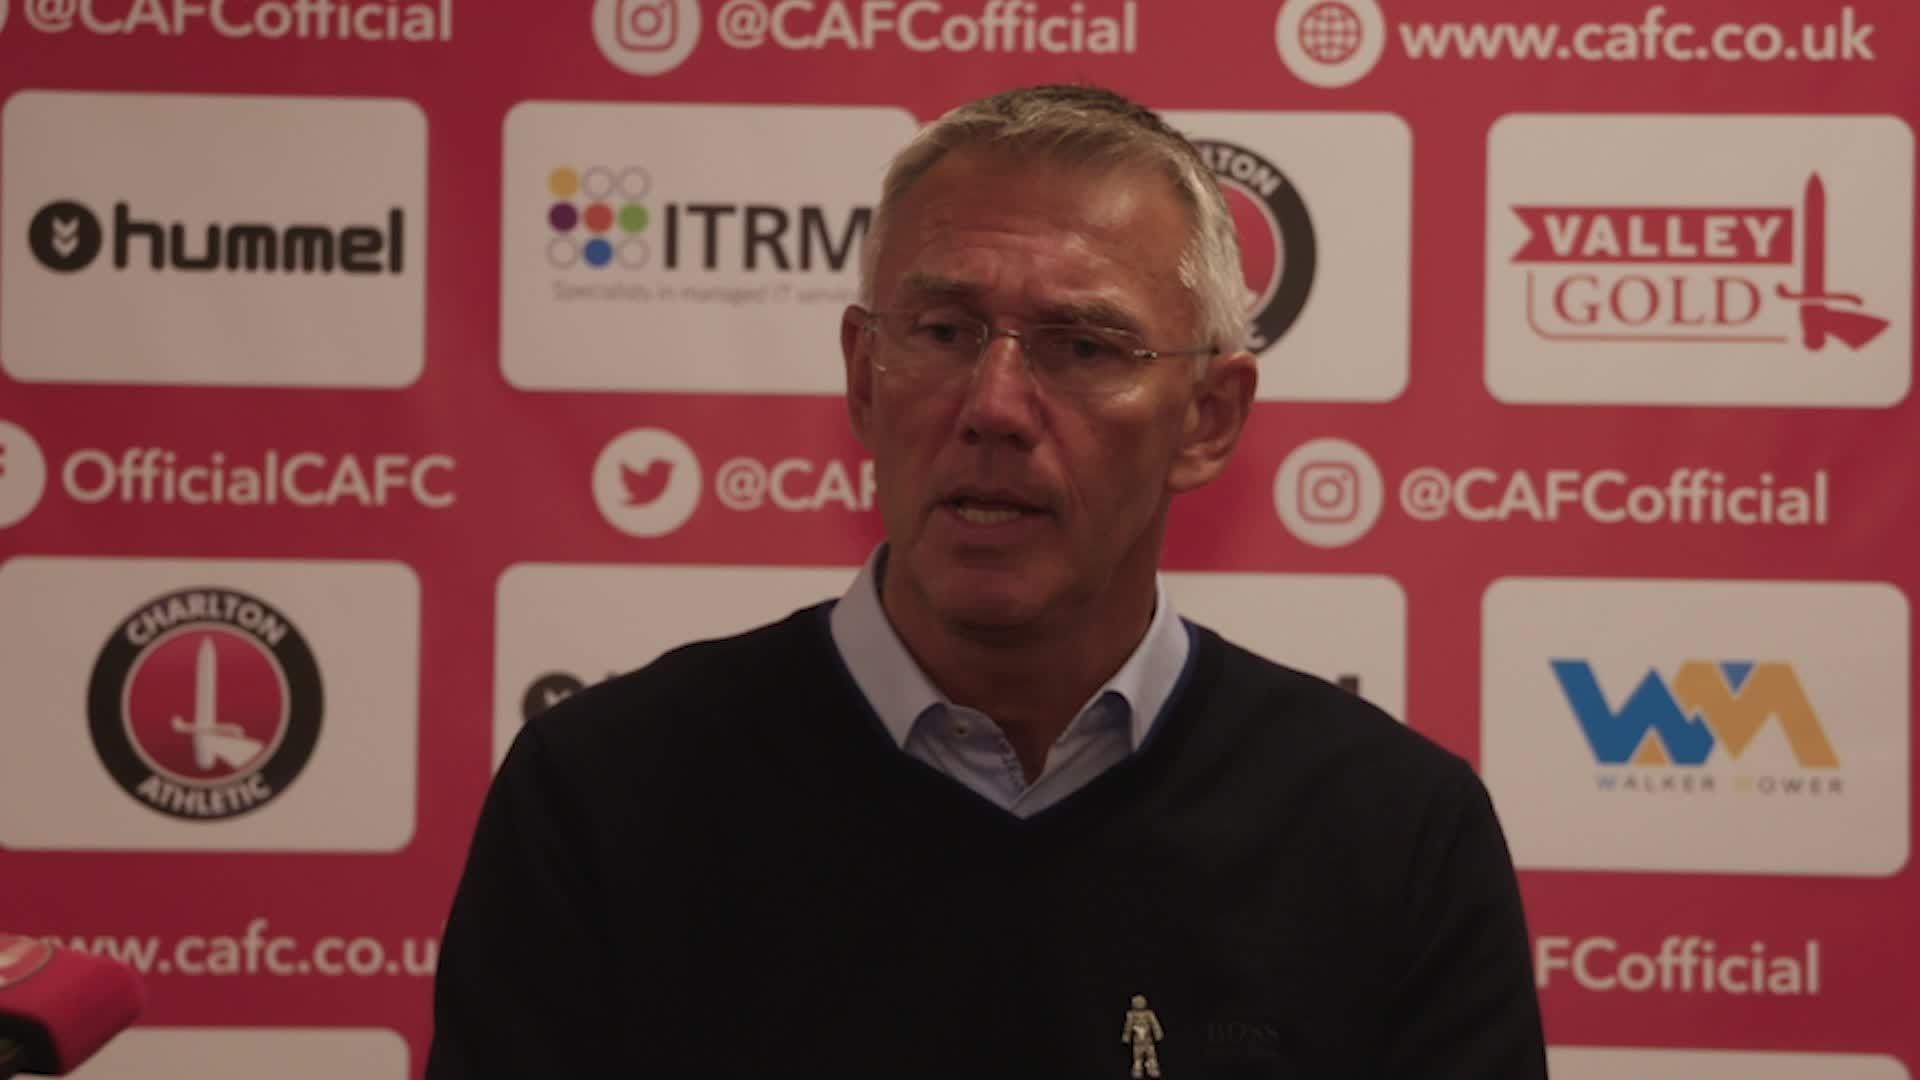 Nigel Adkins post-AFC Wimbledon press conference (August 2021)